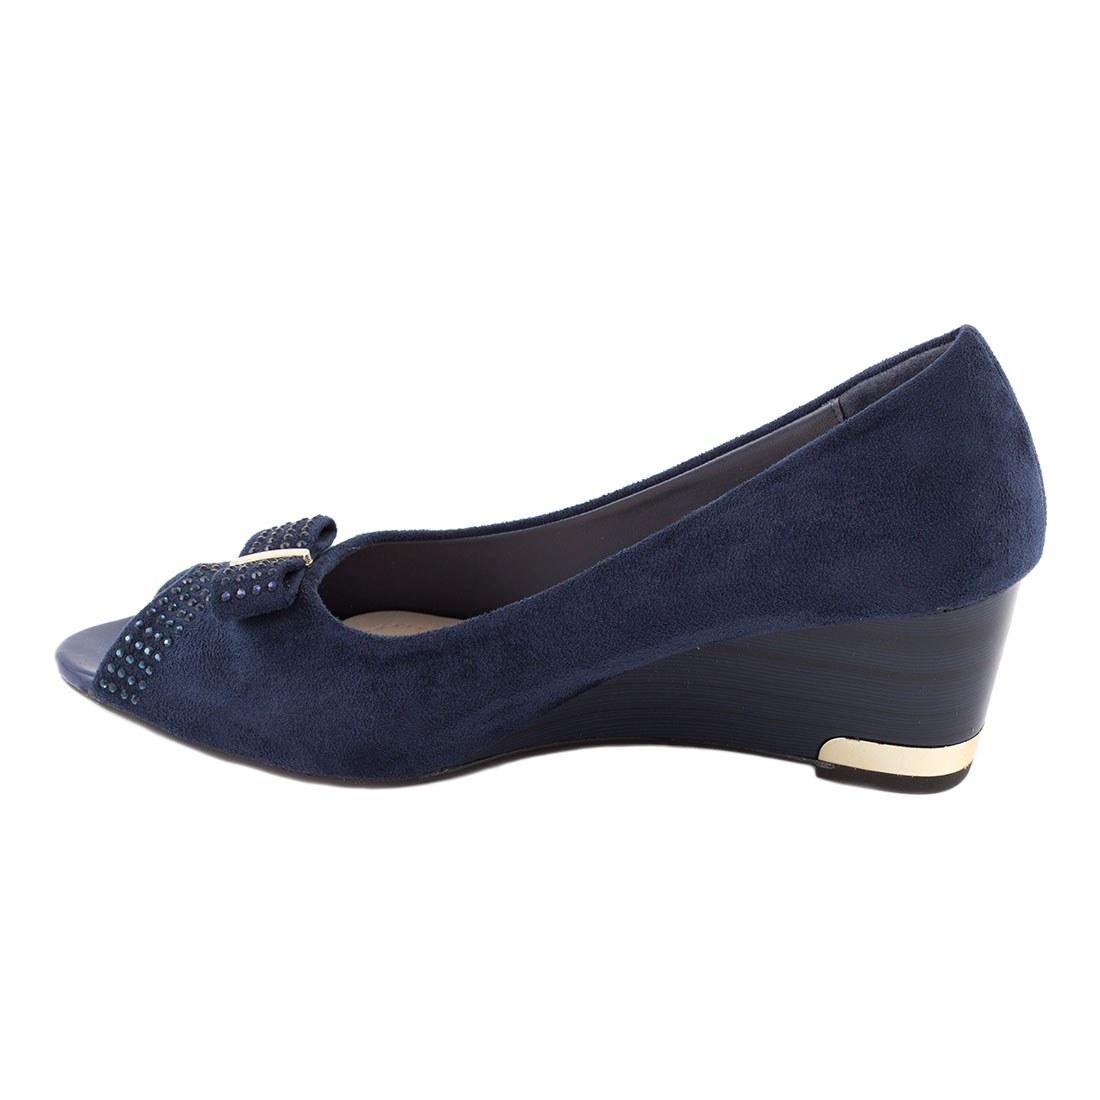 Pantofi dama cu fundita B1-26-BLUE